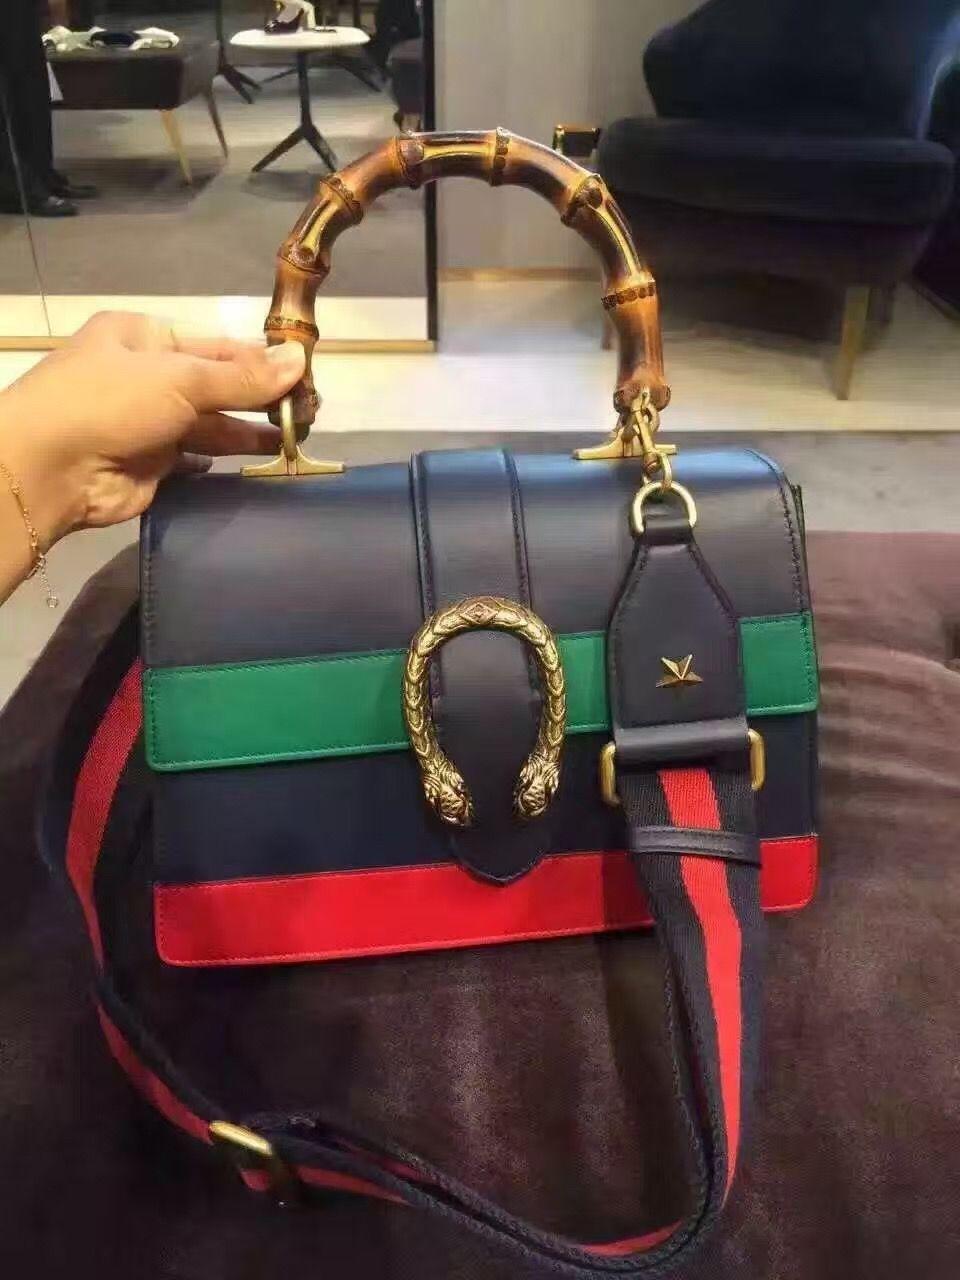 Gucci Dionysus Multicolor Leather Top Handle Bag 421999 Discount Price www.lamodabags.com  #bamboo #guccibamboo #guccihandlebag #guccibag